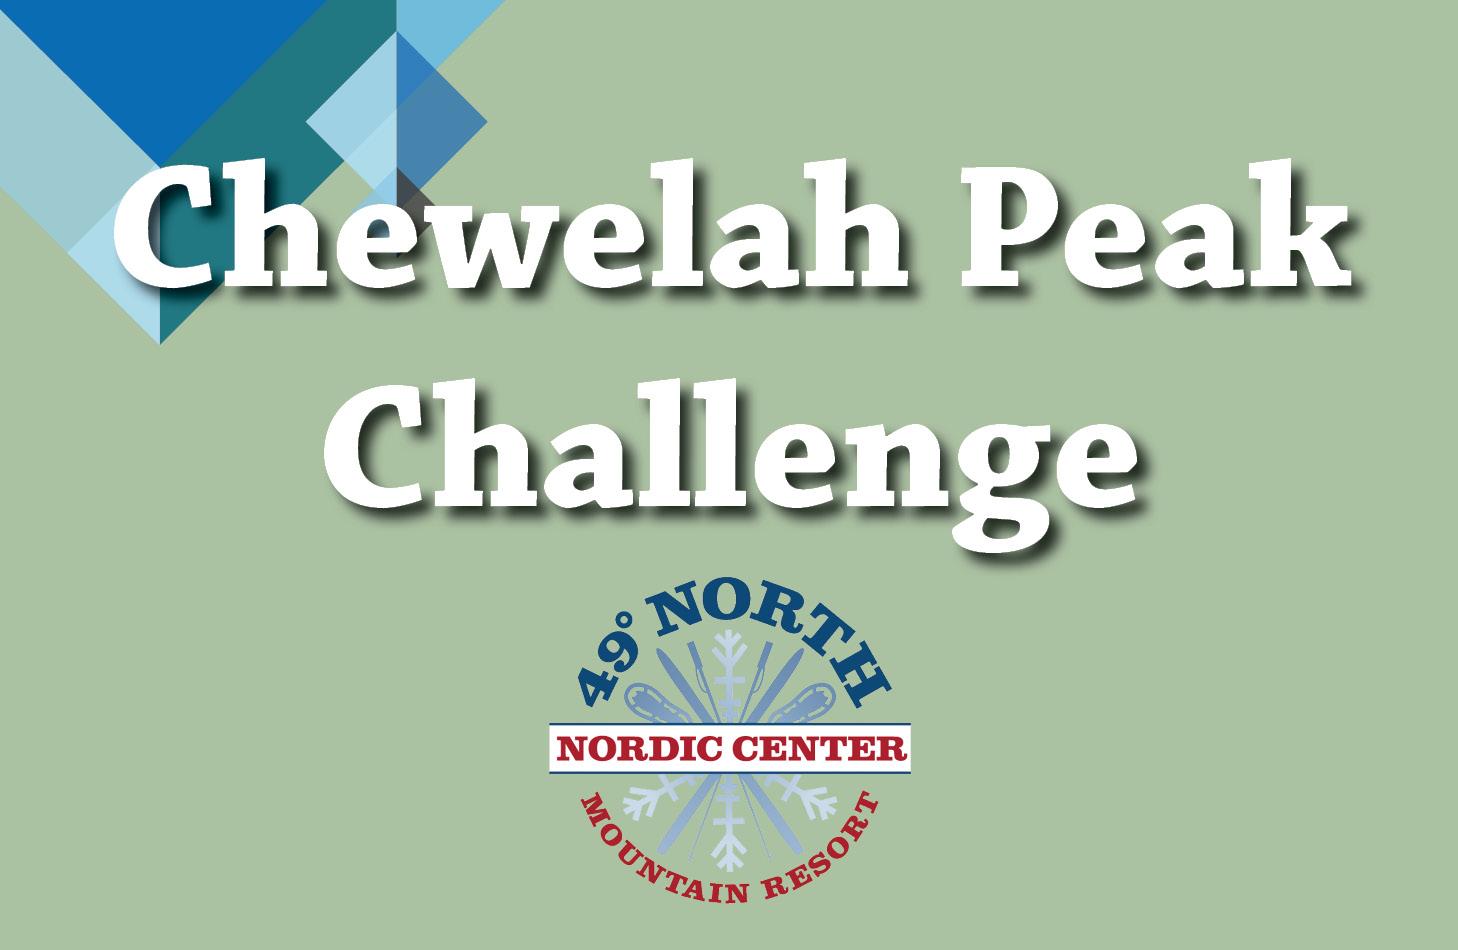 Chewelah Peak Challenge